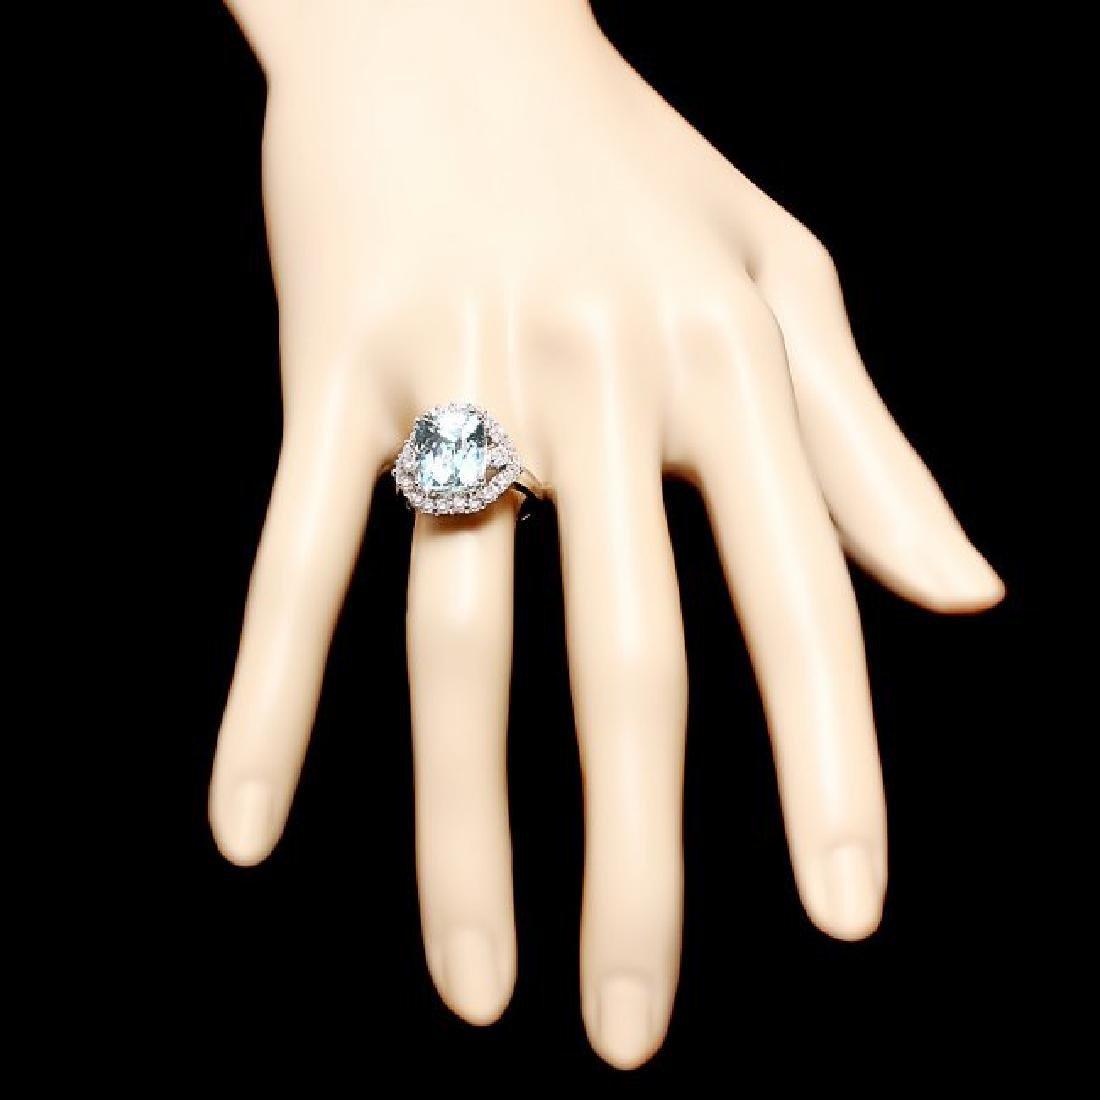 14k Gold 5.00ct Aquamarine 1.00ct Diamond Ring - 4